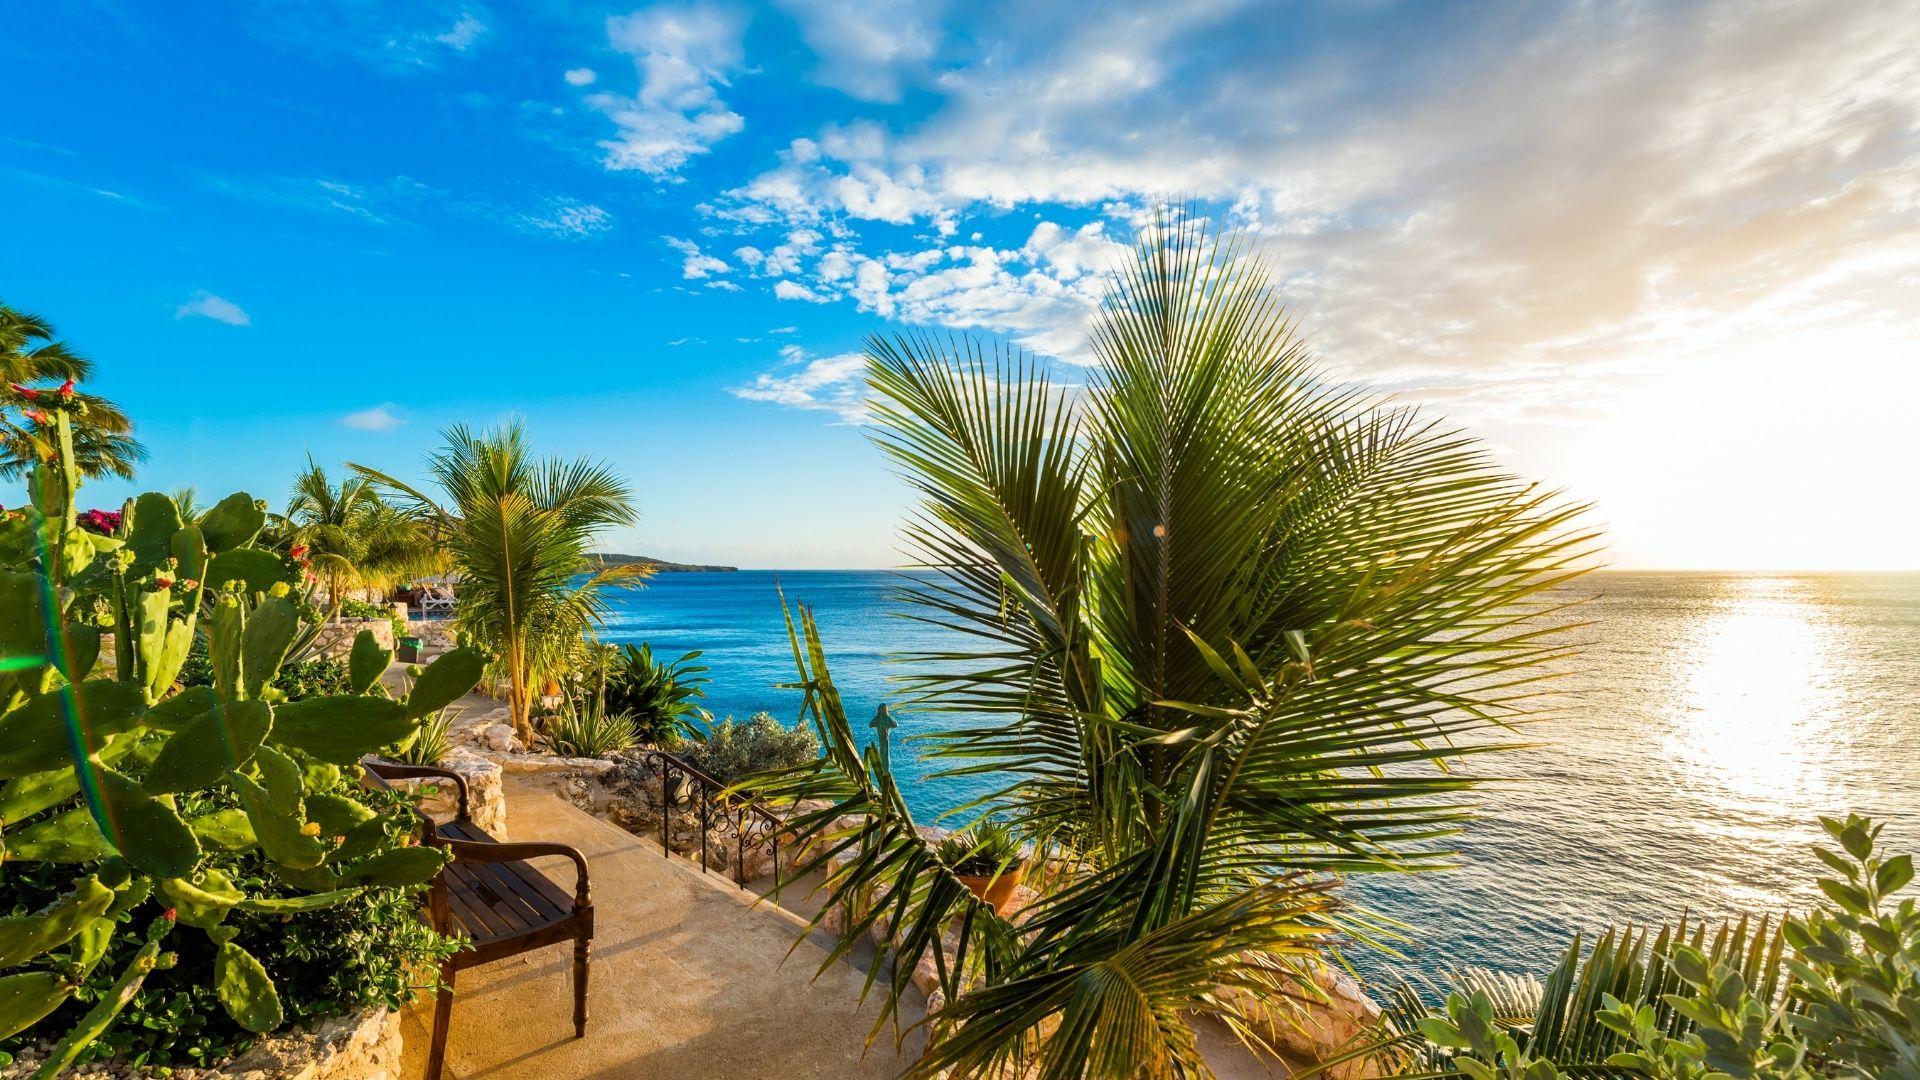 curacao island playa lagun